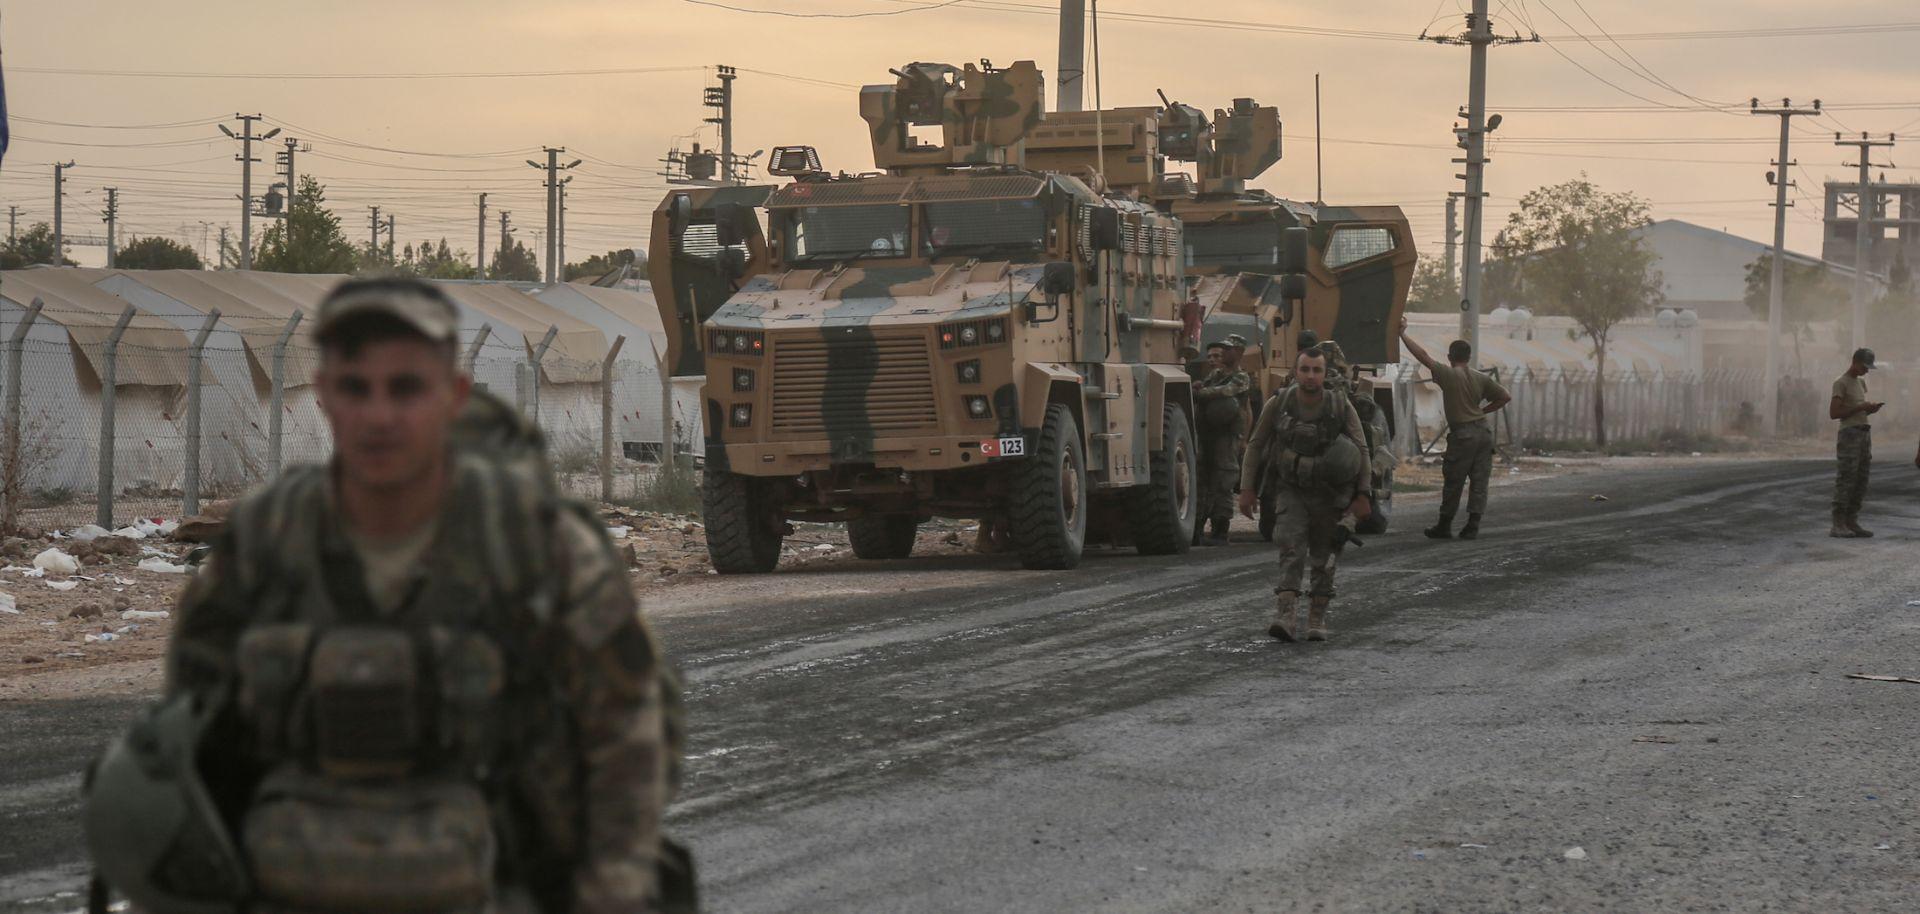 Turkish forces in Akcakale, Turkey near the Syrian border.